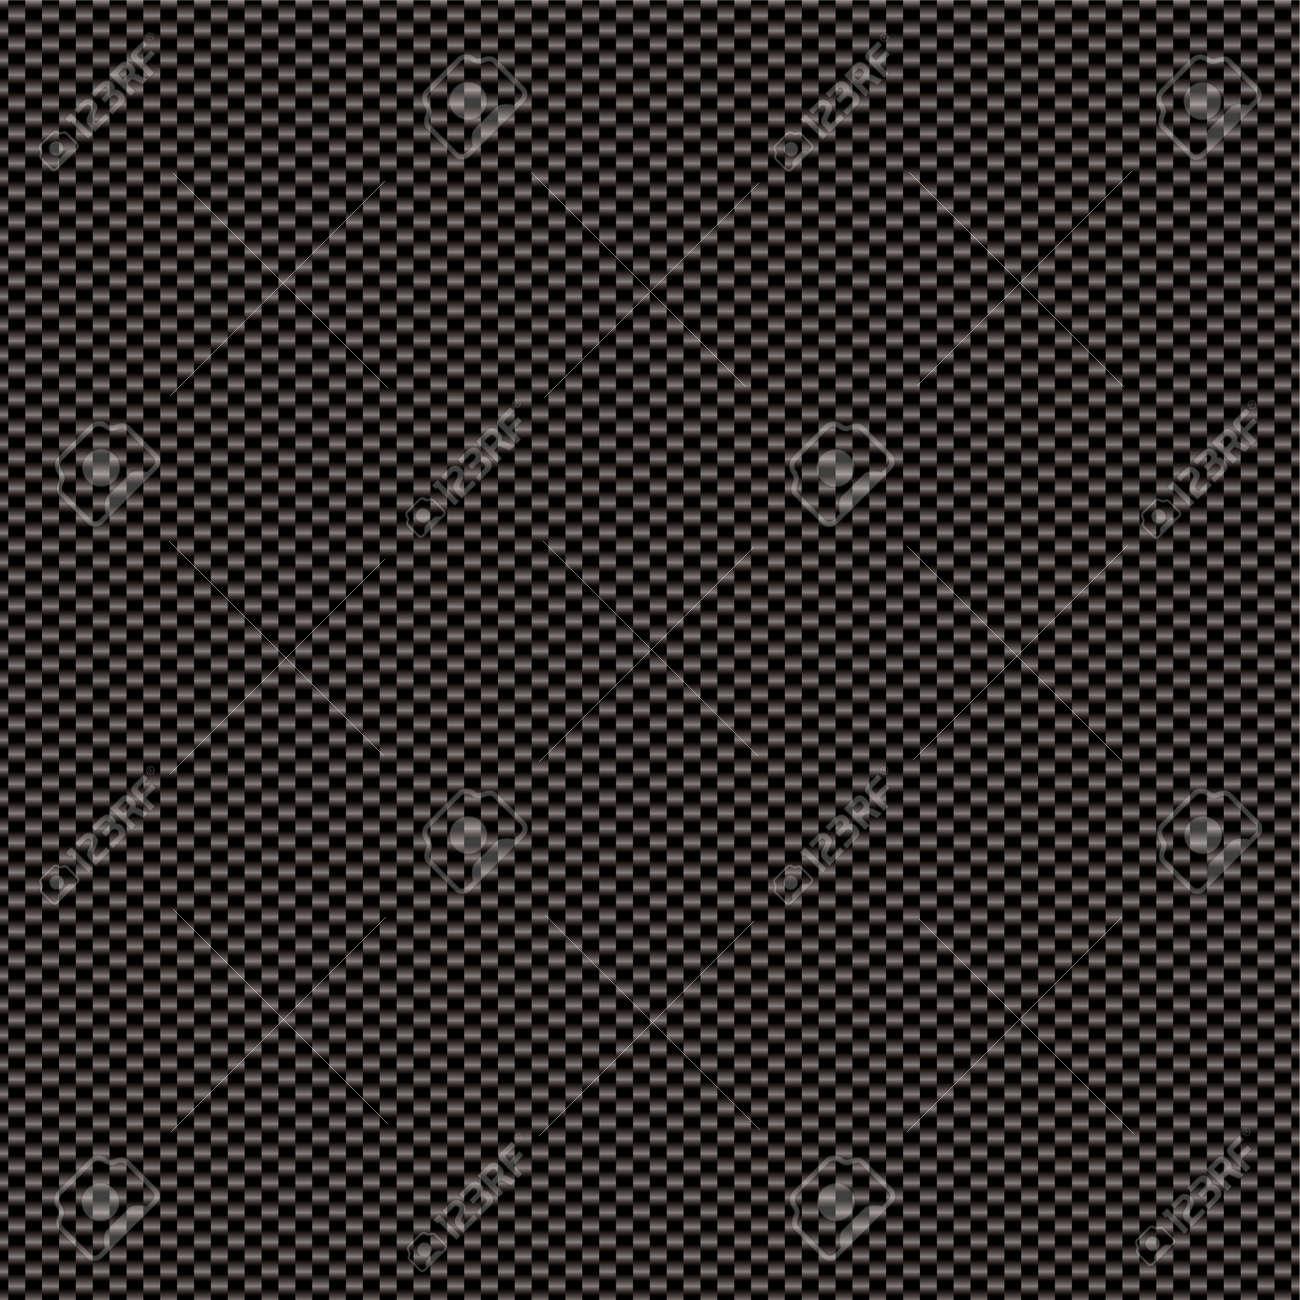 Modern carbon fiber black and grey seamless background - 8031191